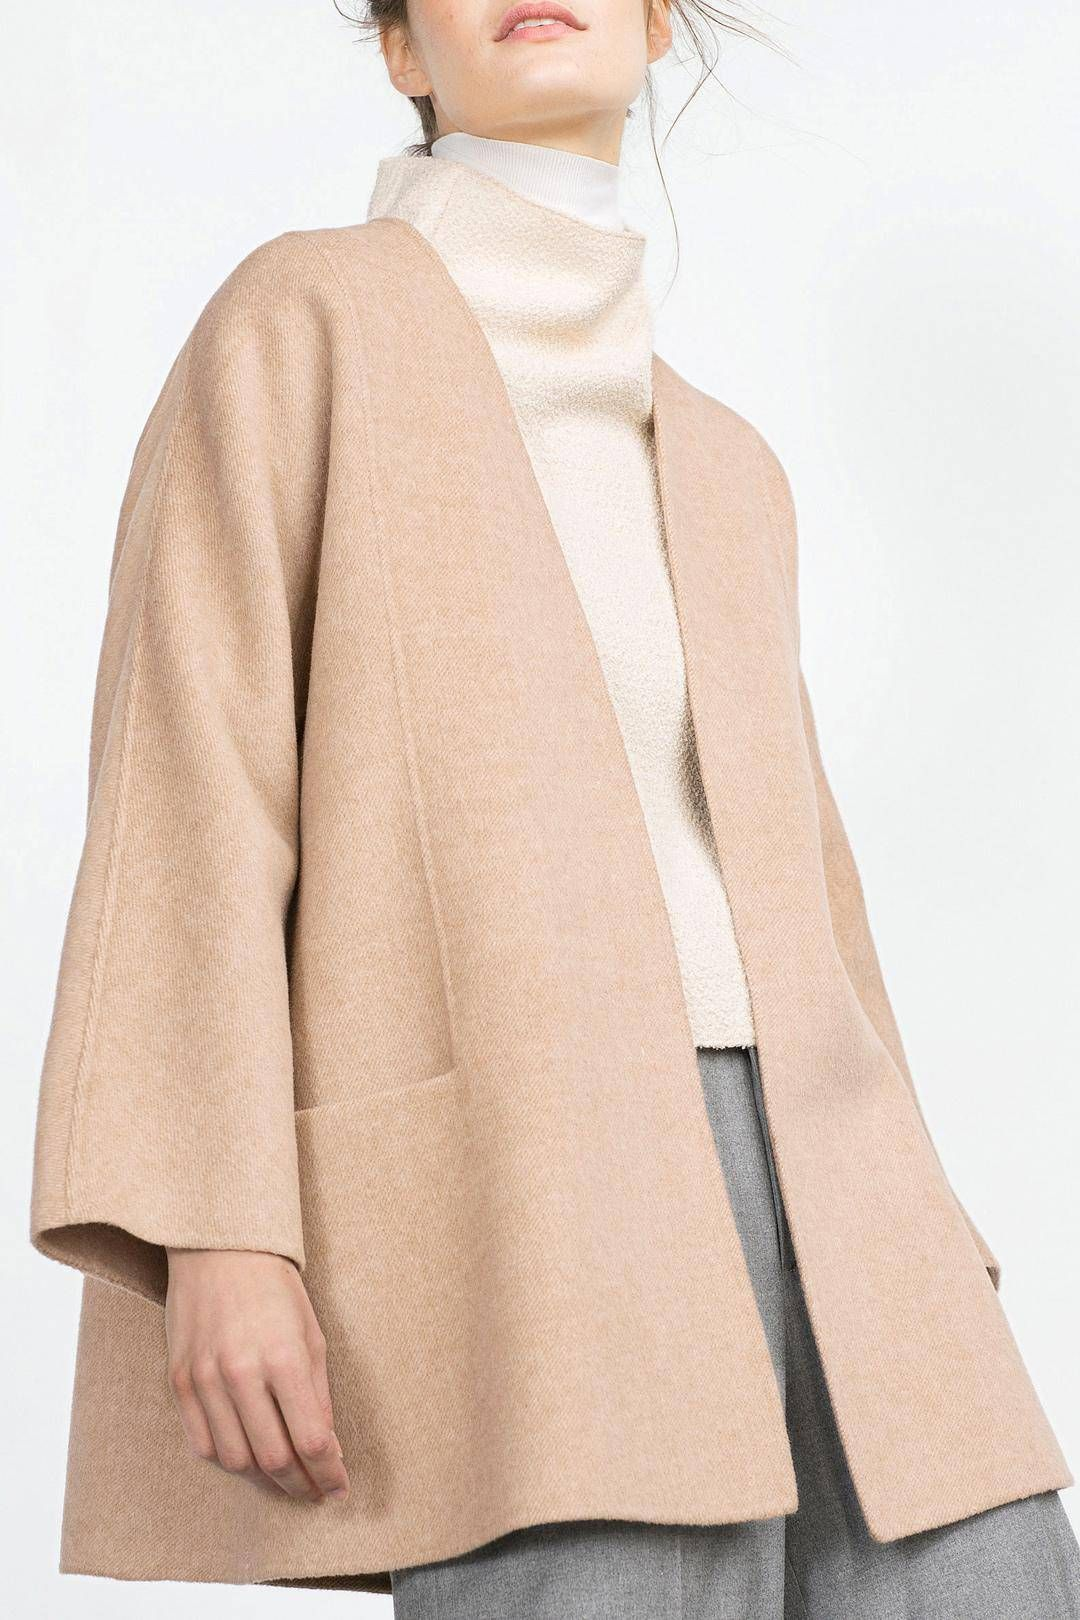 Duffle Coat with Pocket – US$49.95